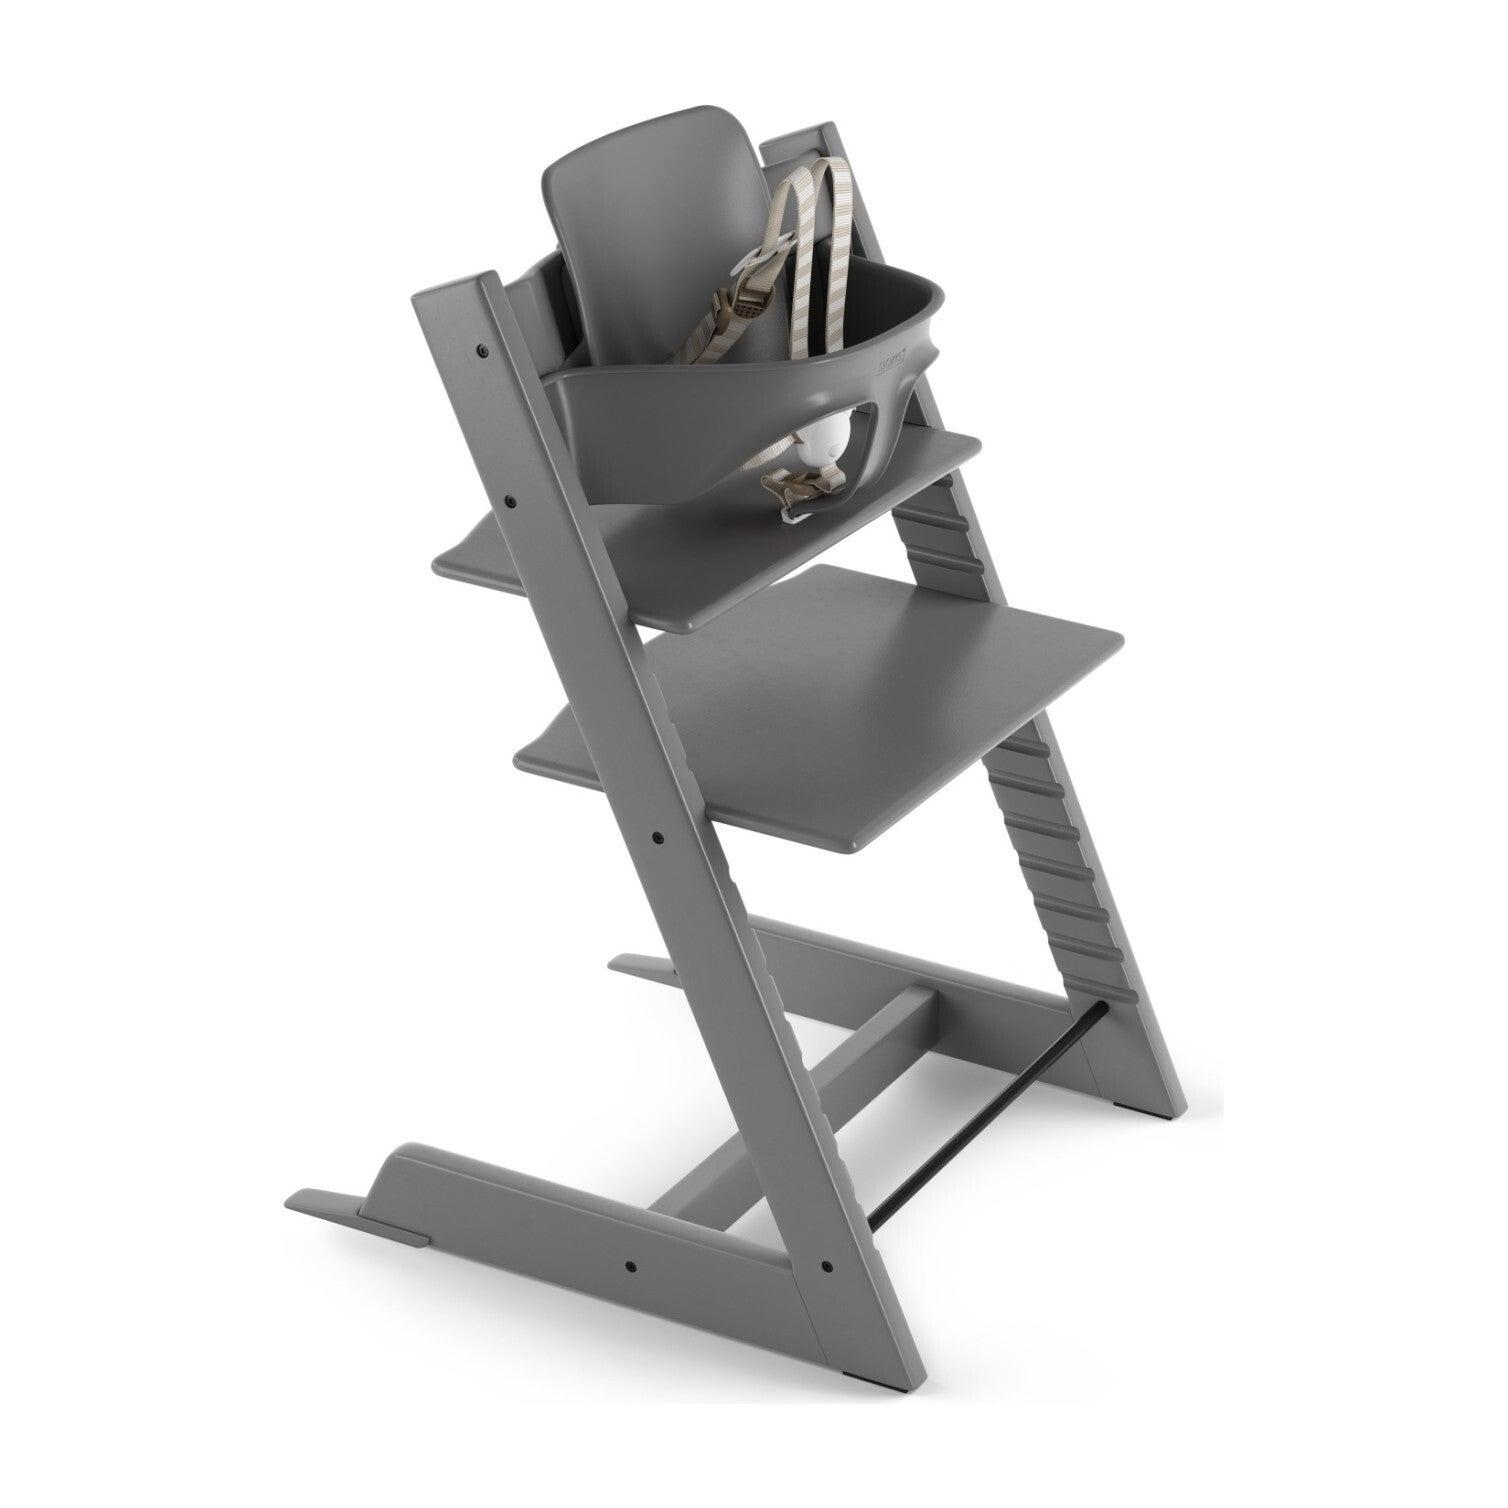 Tripp Trapp® High Chair (includes Tripp Trapp® + Baby set), Storm Grey